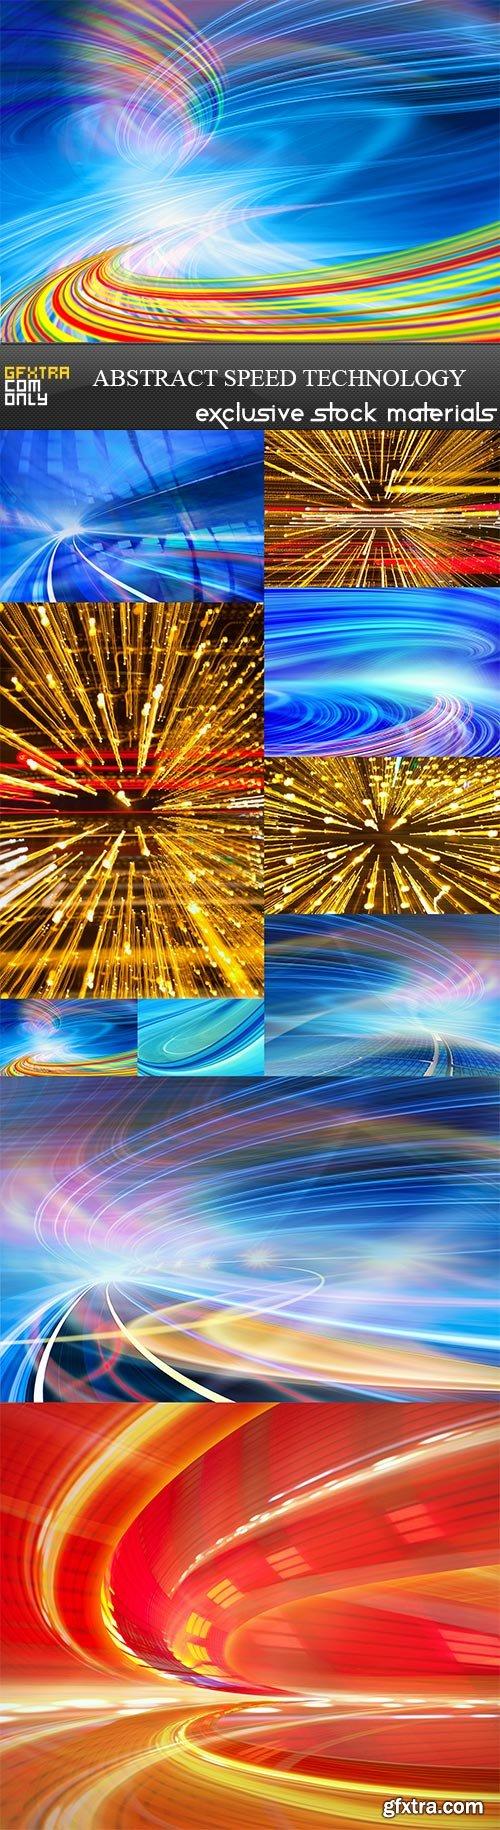 Abstract speed technology, 10  x  UHQ JPEG